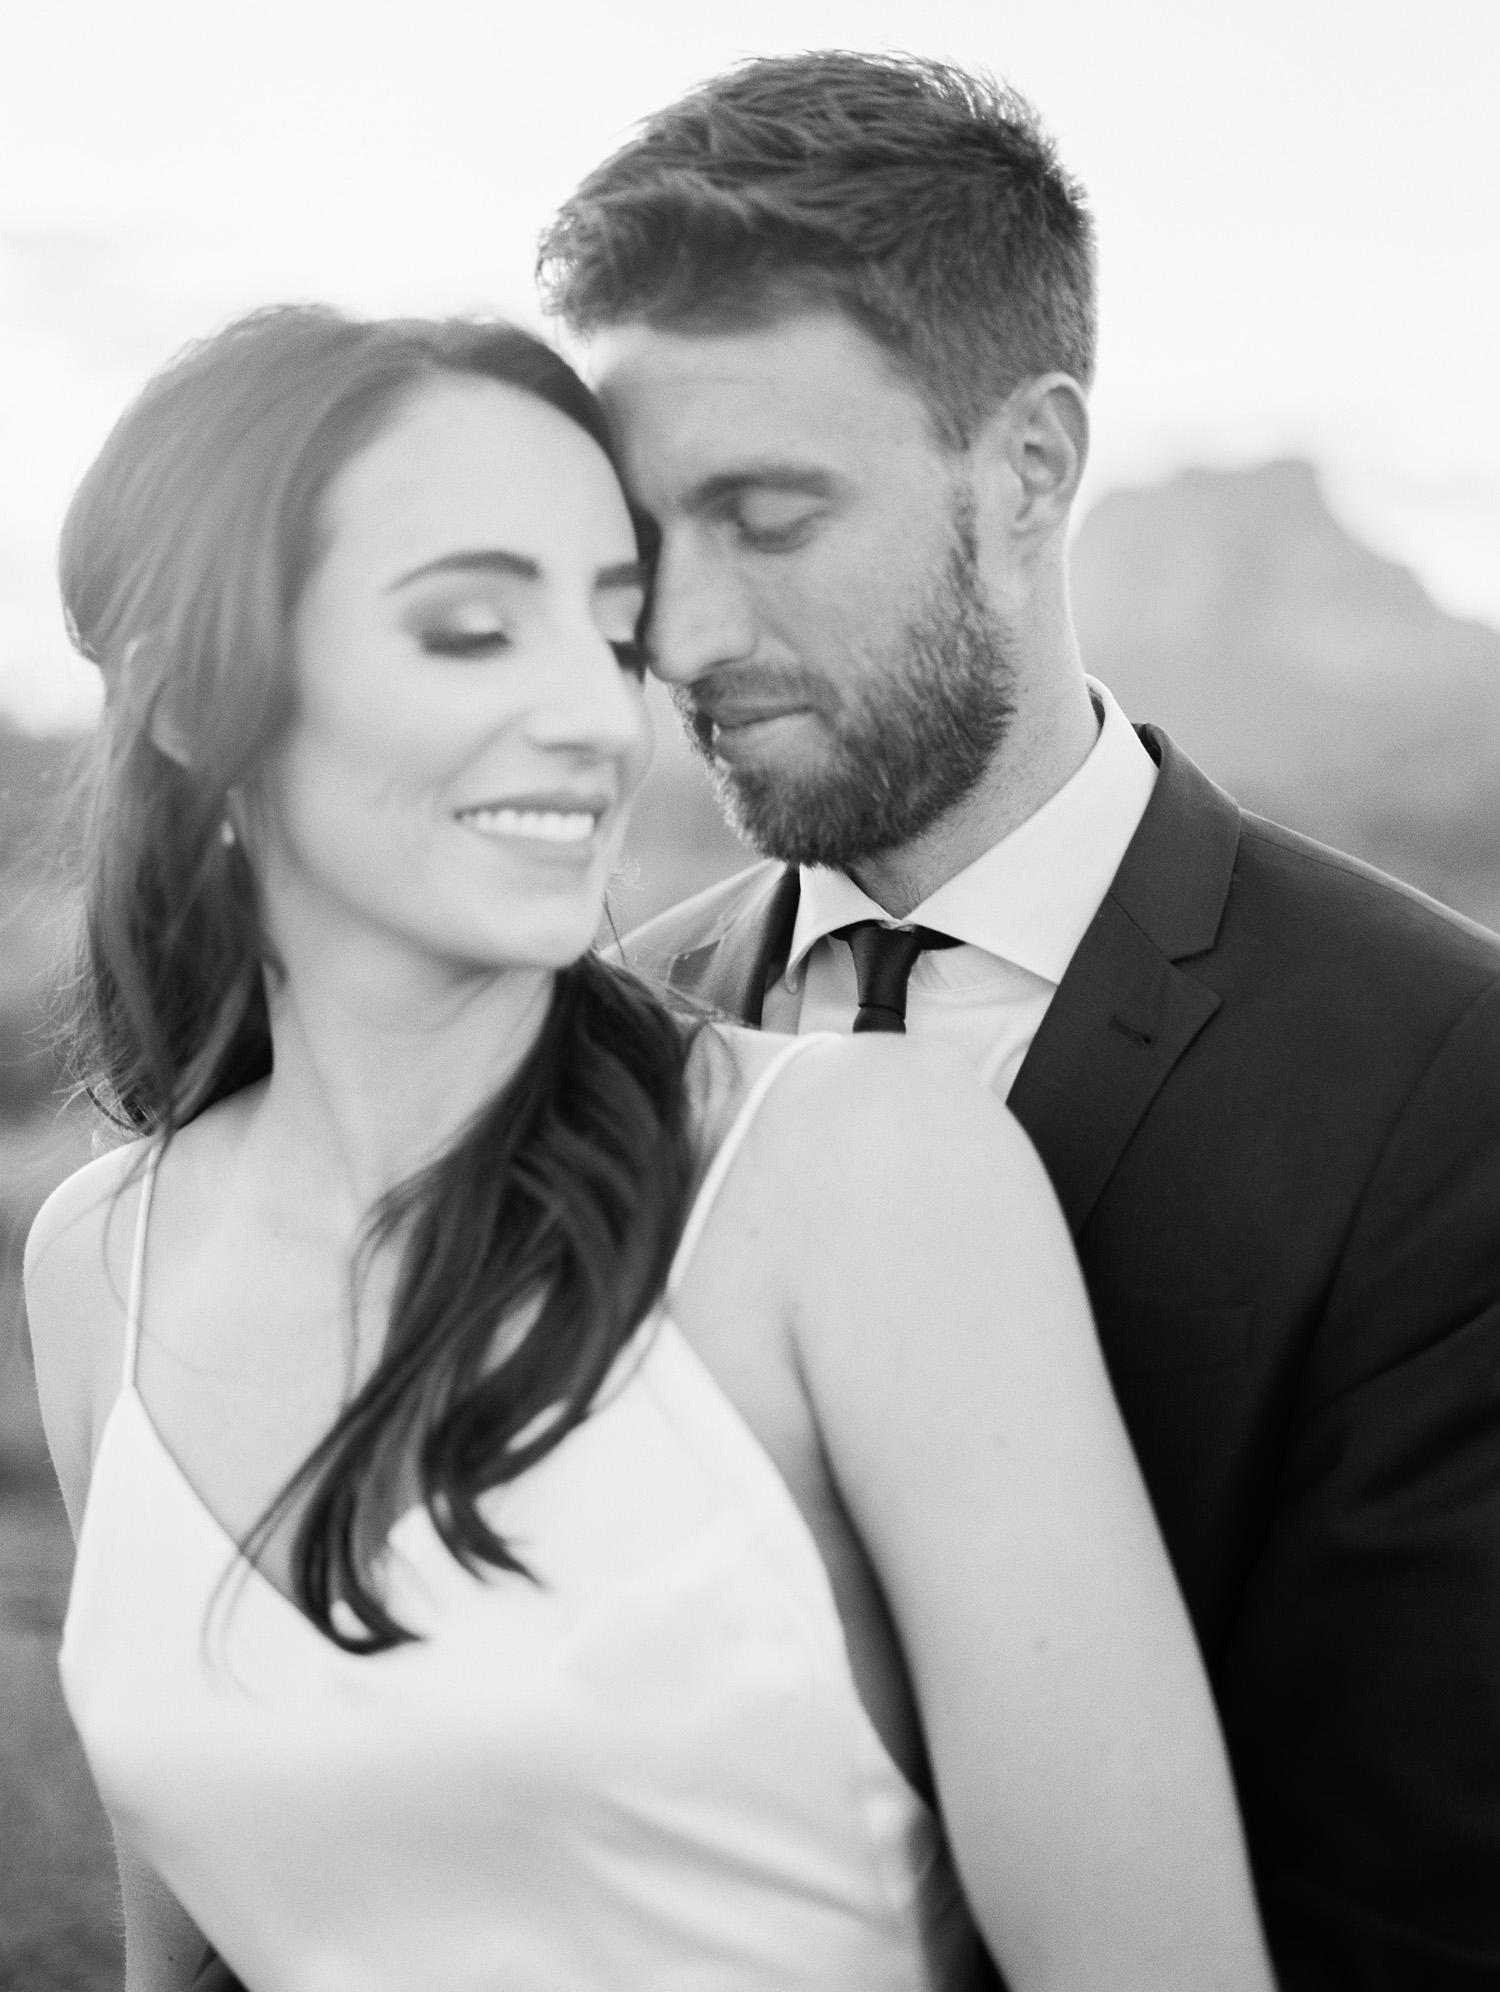 A romantic moment on their wedding day in Phoenix, Arizona.